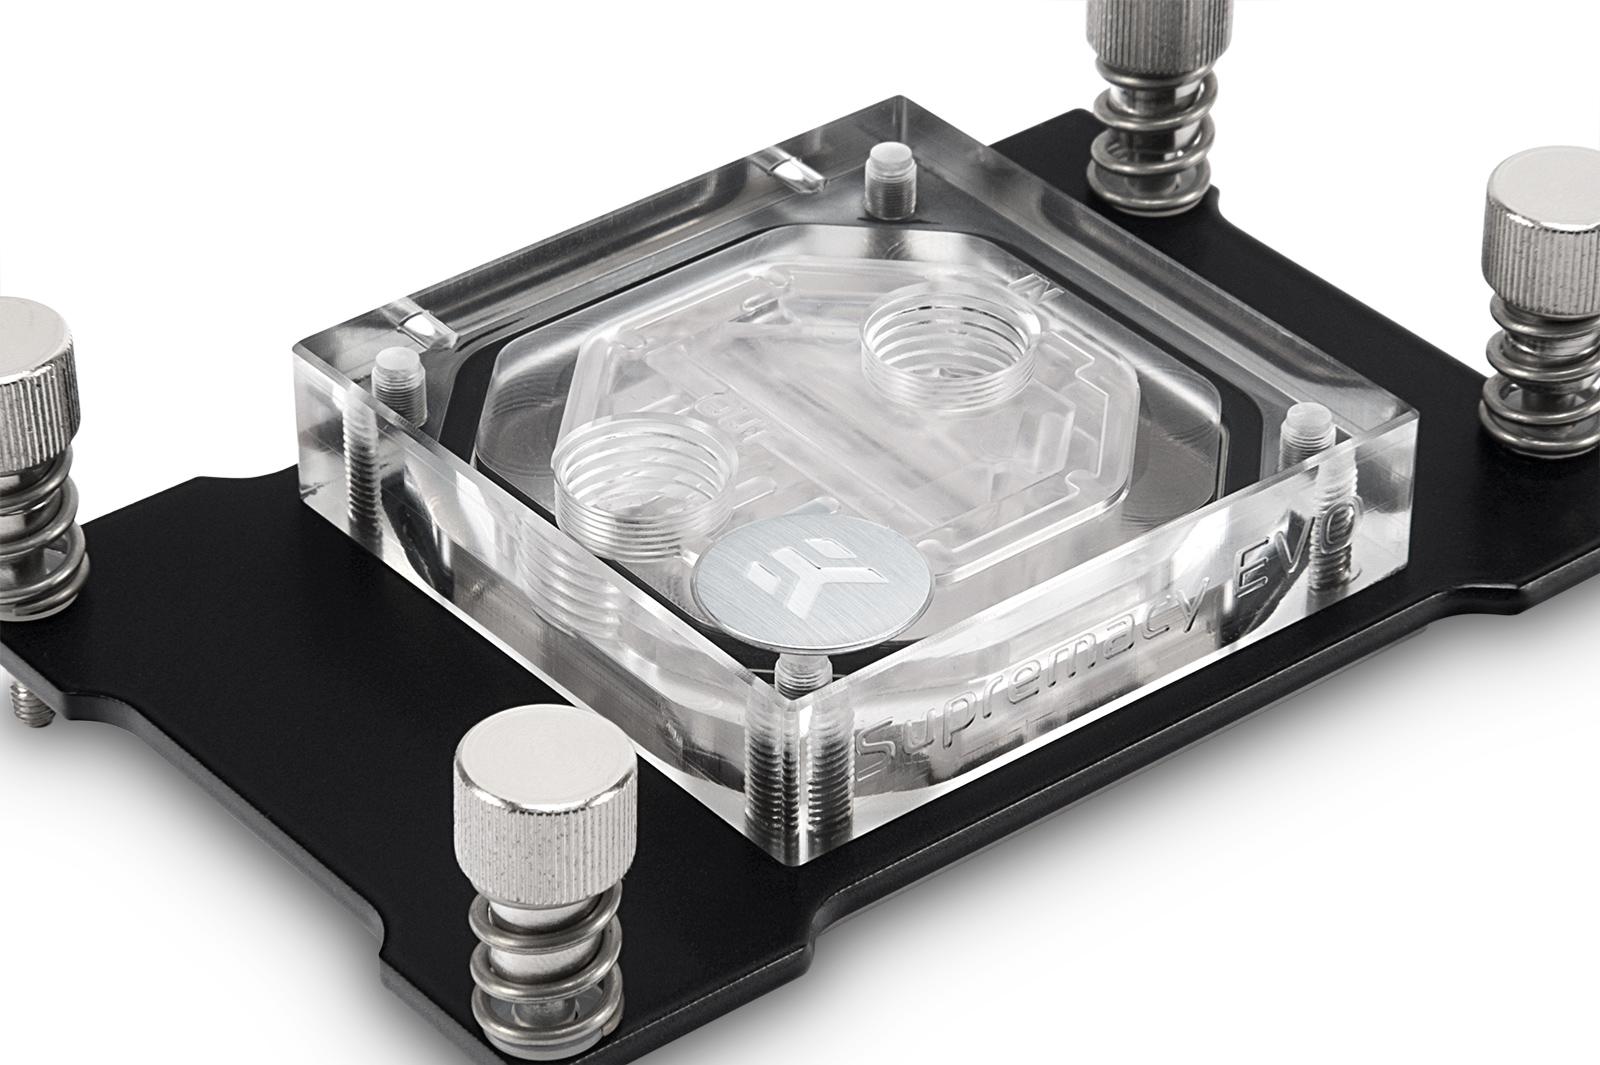 <b>Jual Part water cooling PC, by Dangerxxx</b>